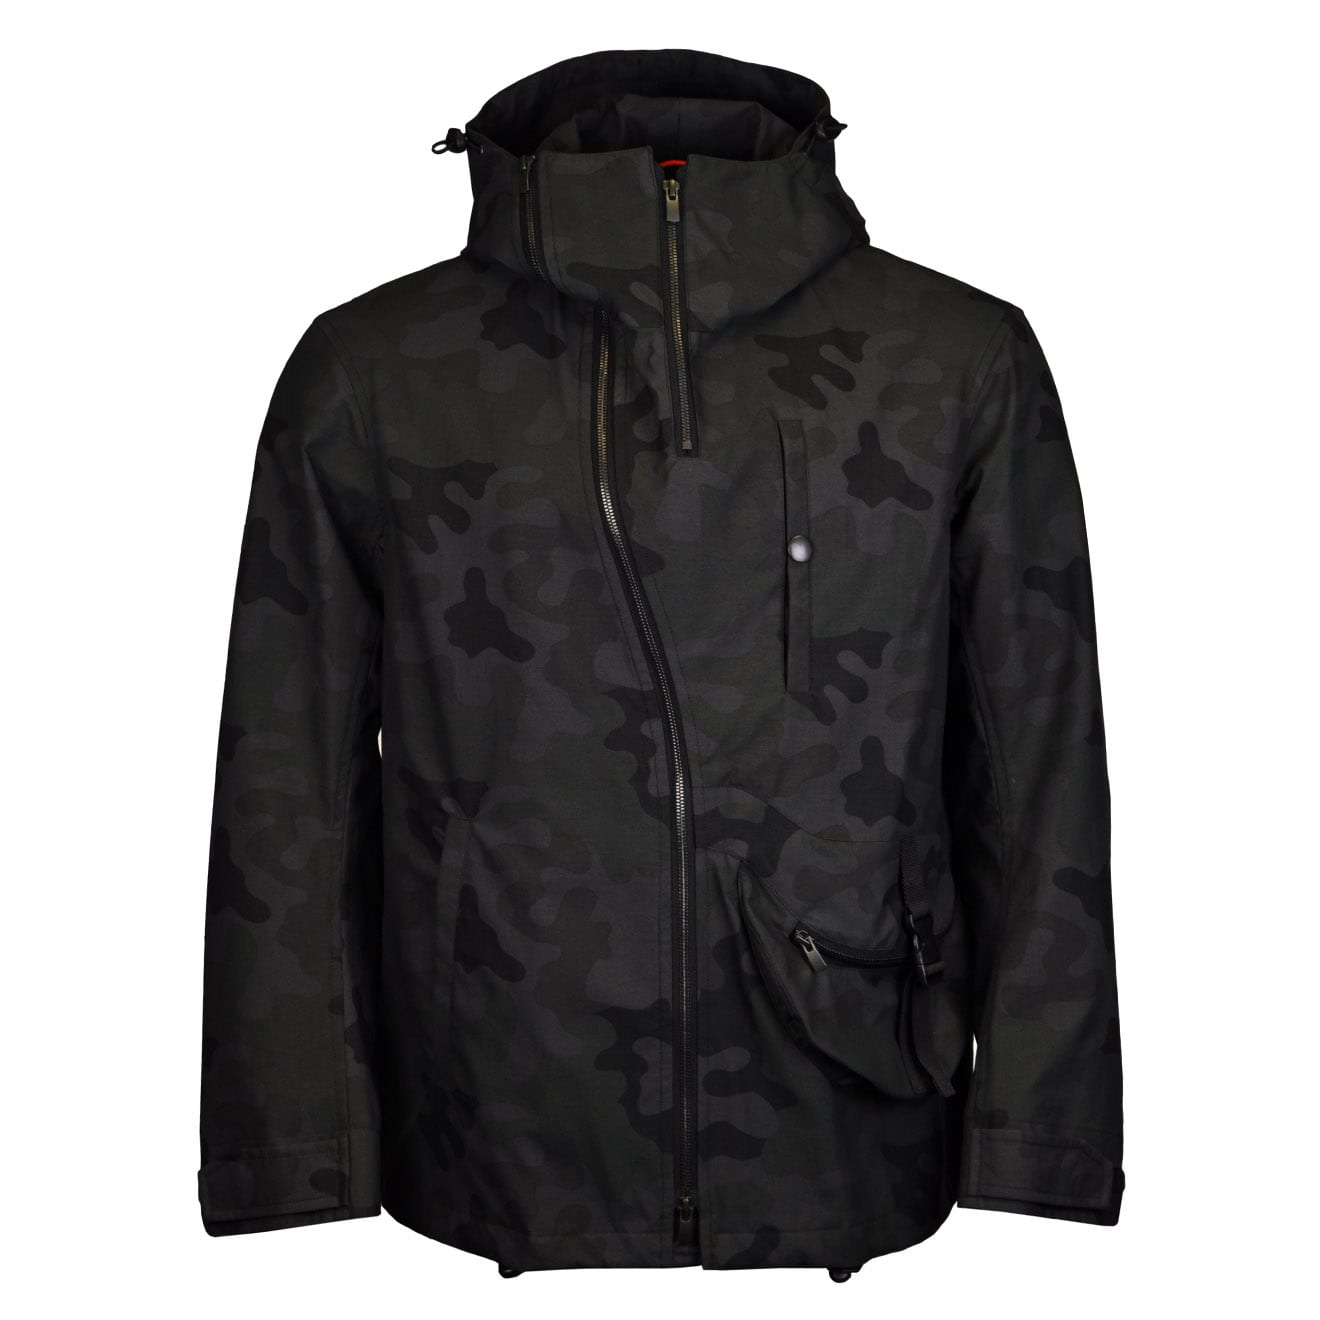 Grenfell Bowfell Jacket Camo Black